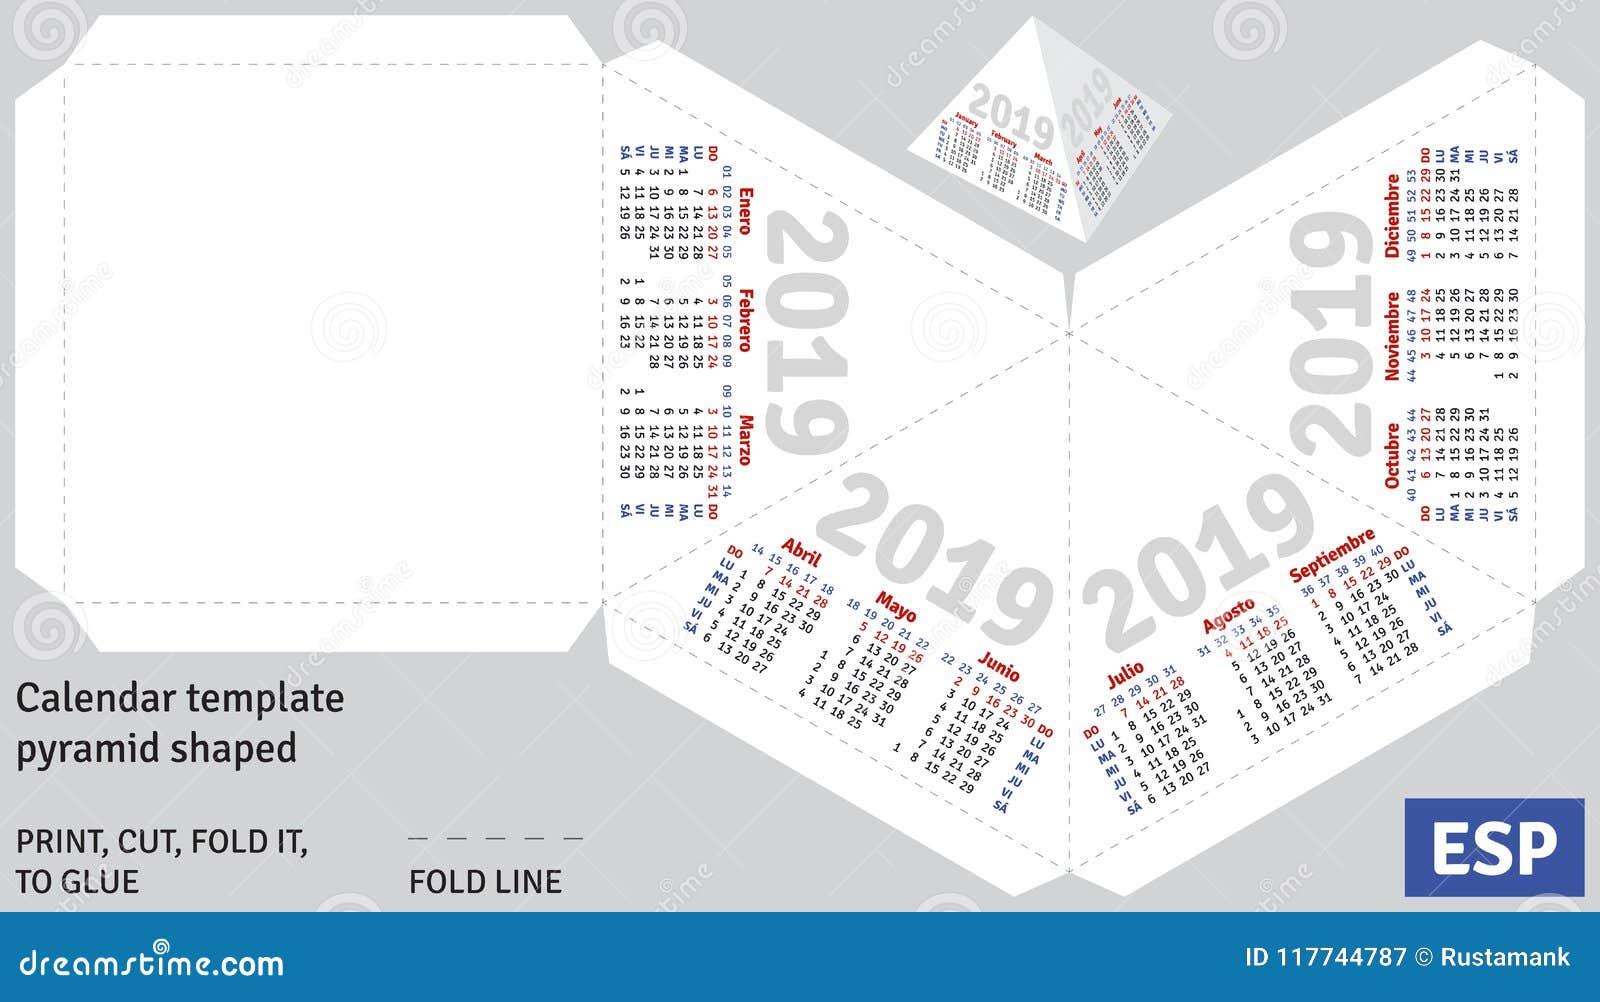 Template Spanish Calendar 2019 Pyramid Shaped Stock Vector